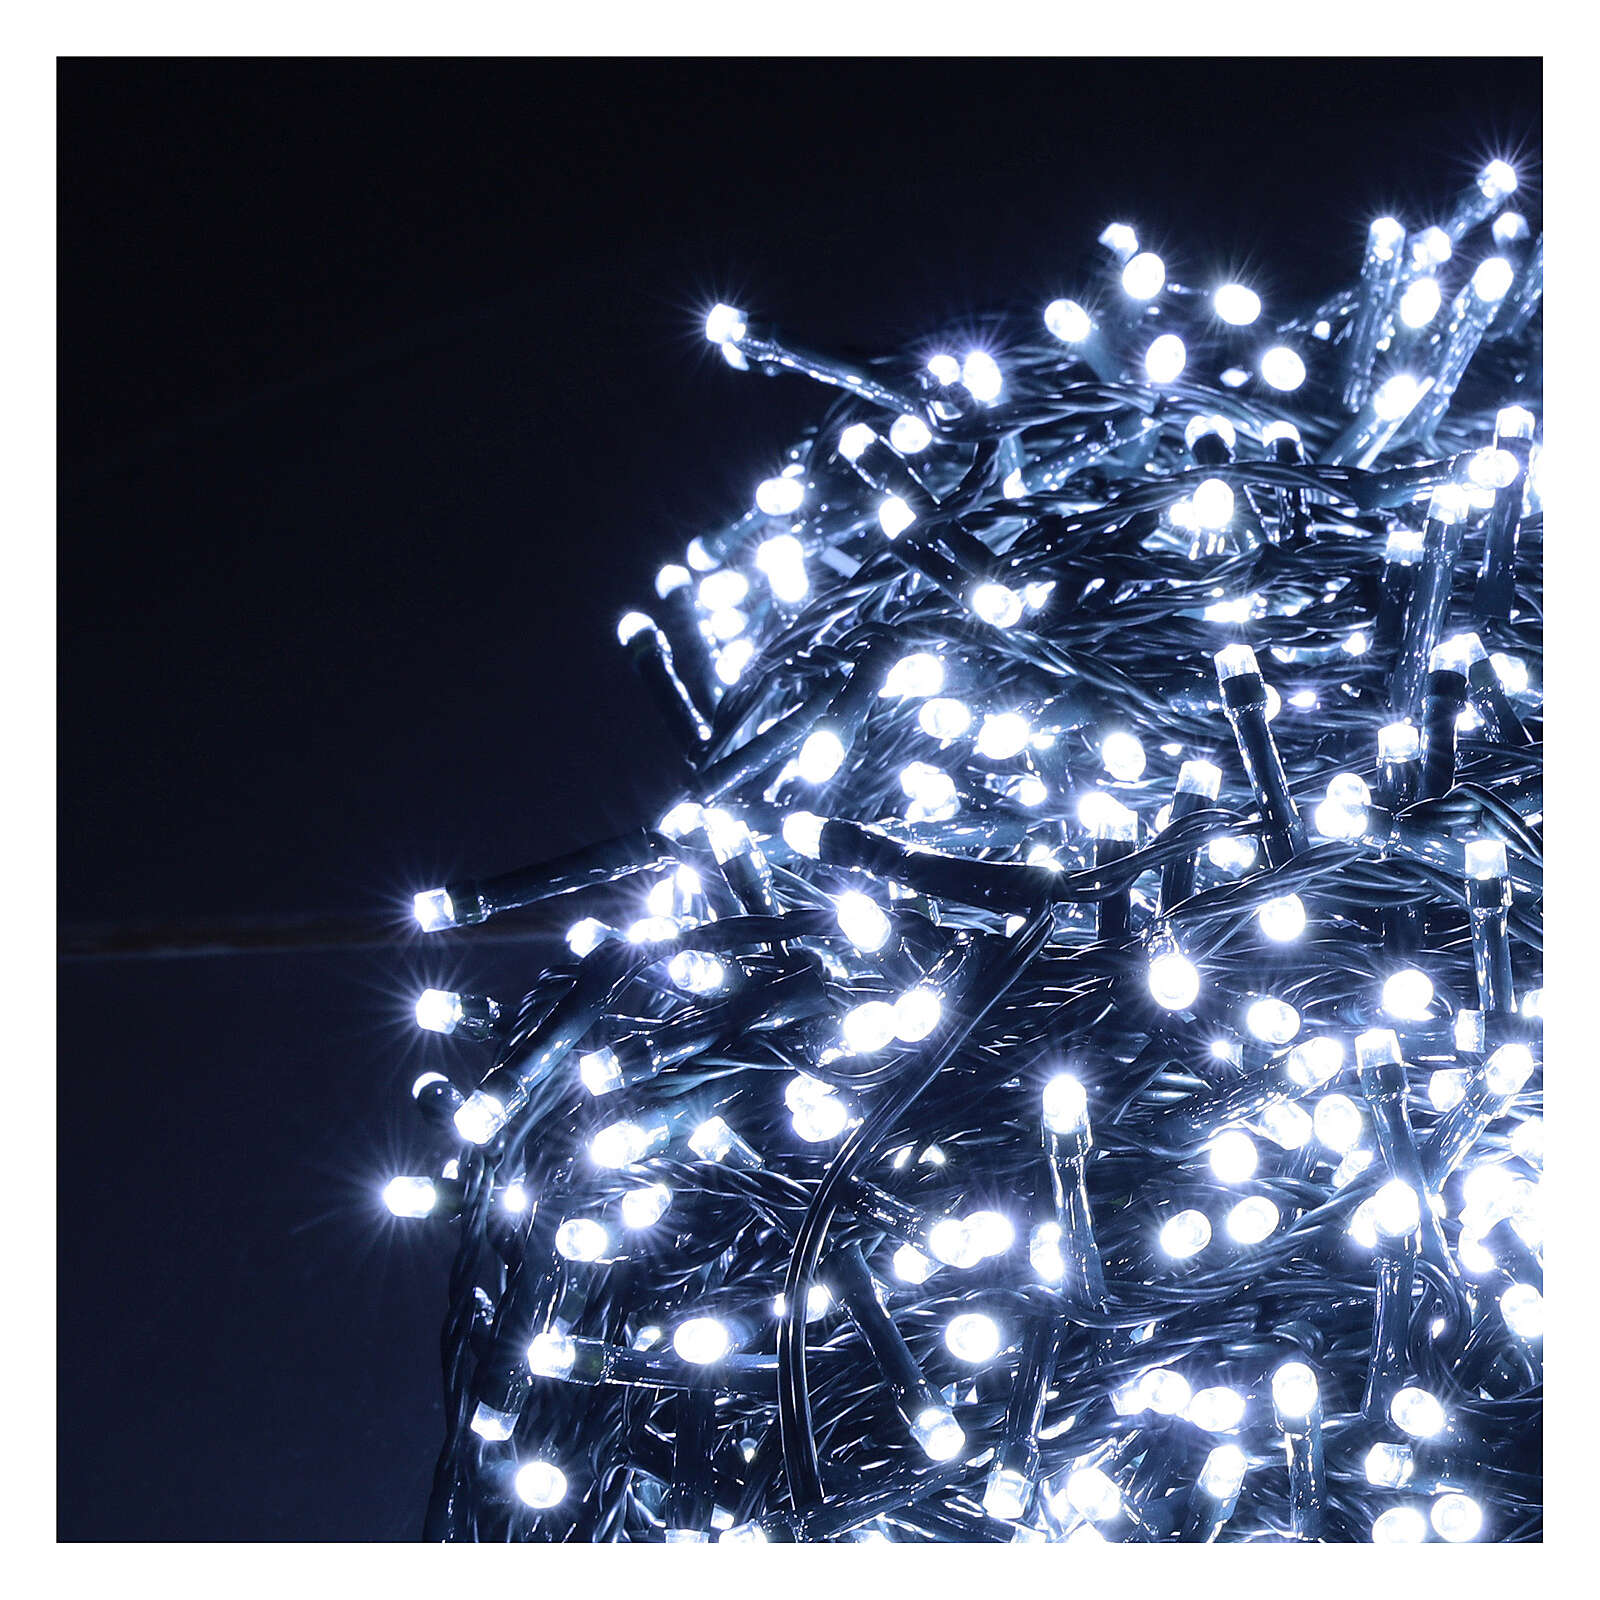 Led Christmas Lights 1200 Cold White 220v External 48 M Online Sales On Holyart Com